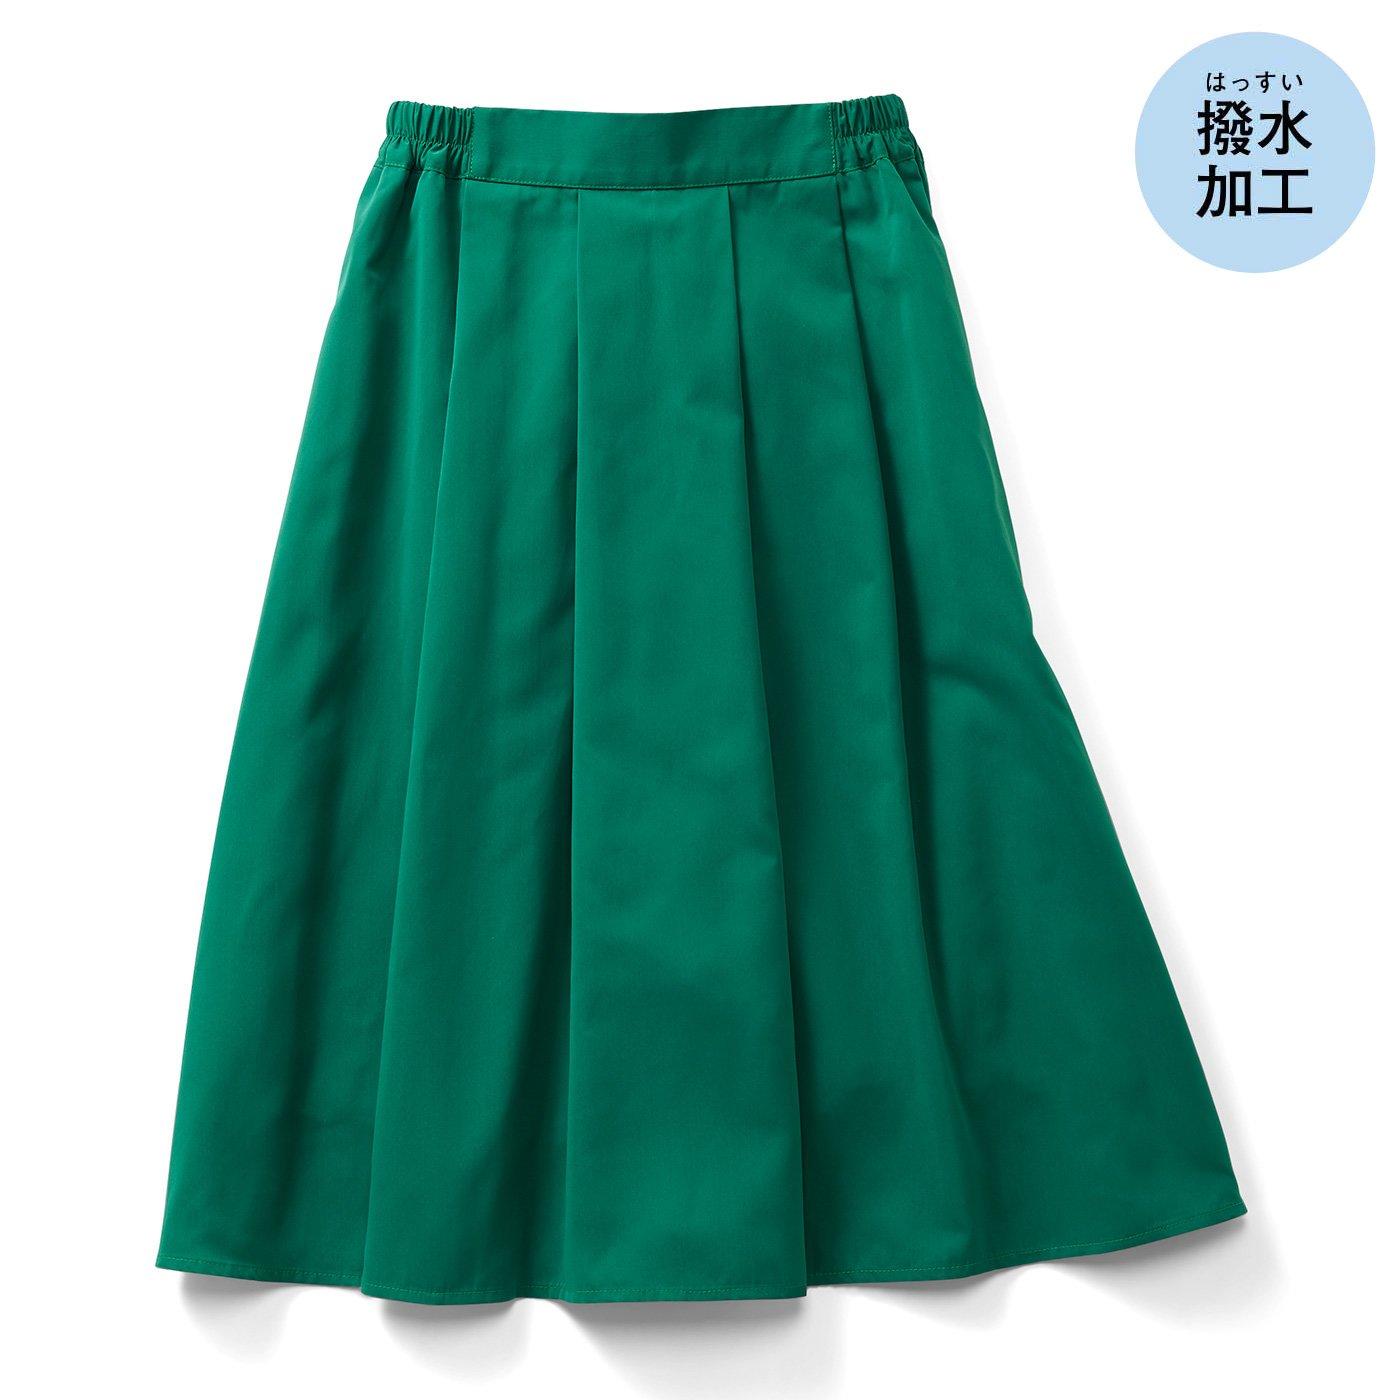 IEDIT[イディット] 撥(はっ)水機能できれいをキープする キレイ色Aラインスカート〈グリーン〉